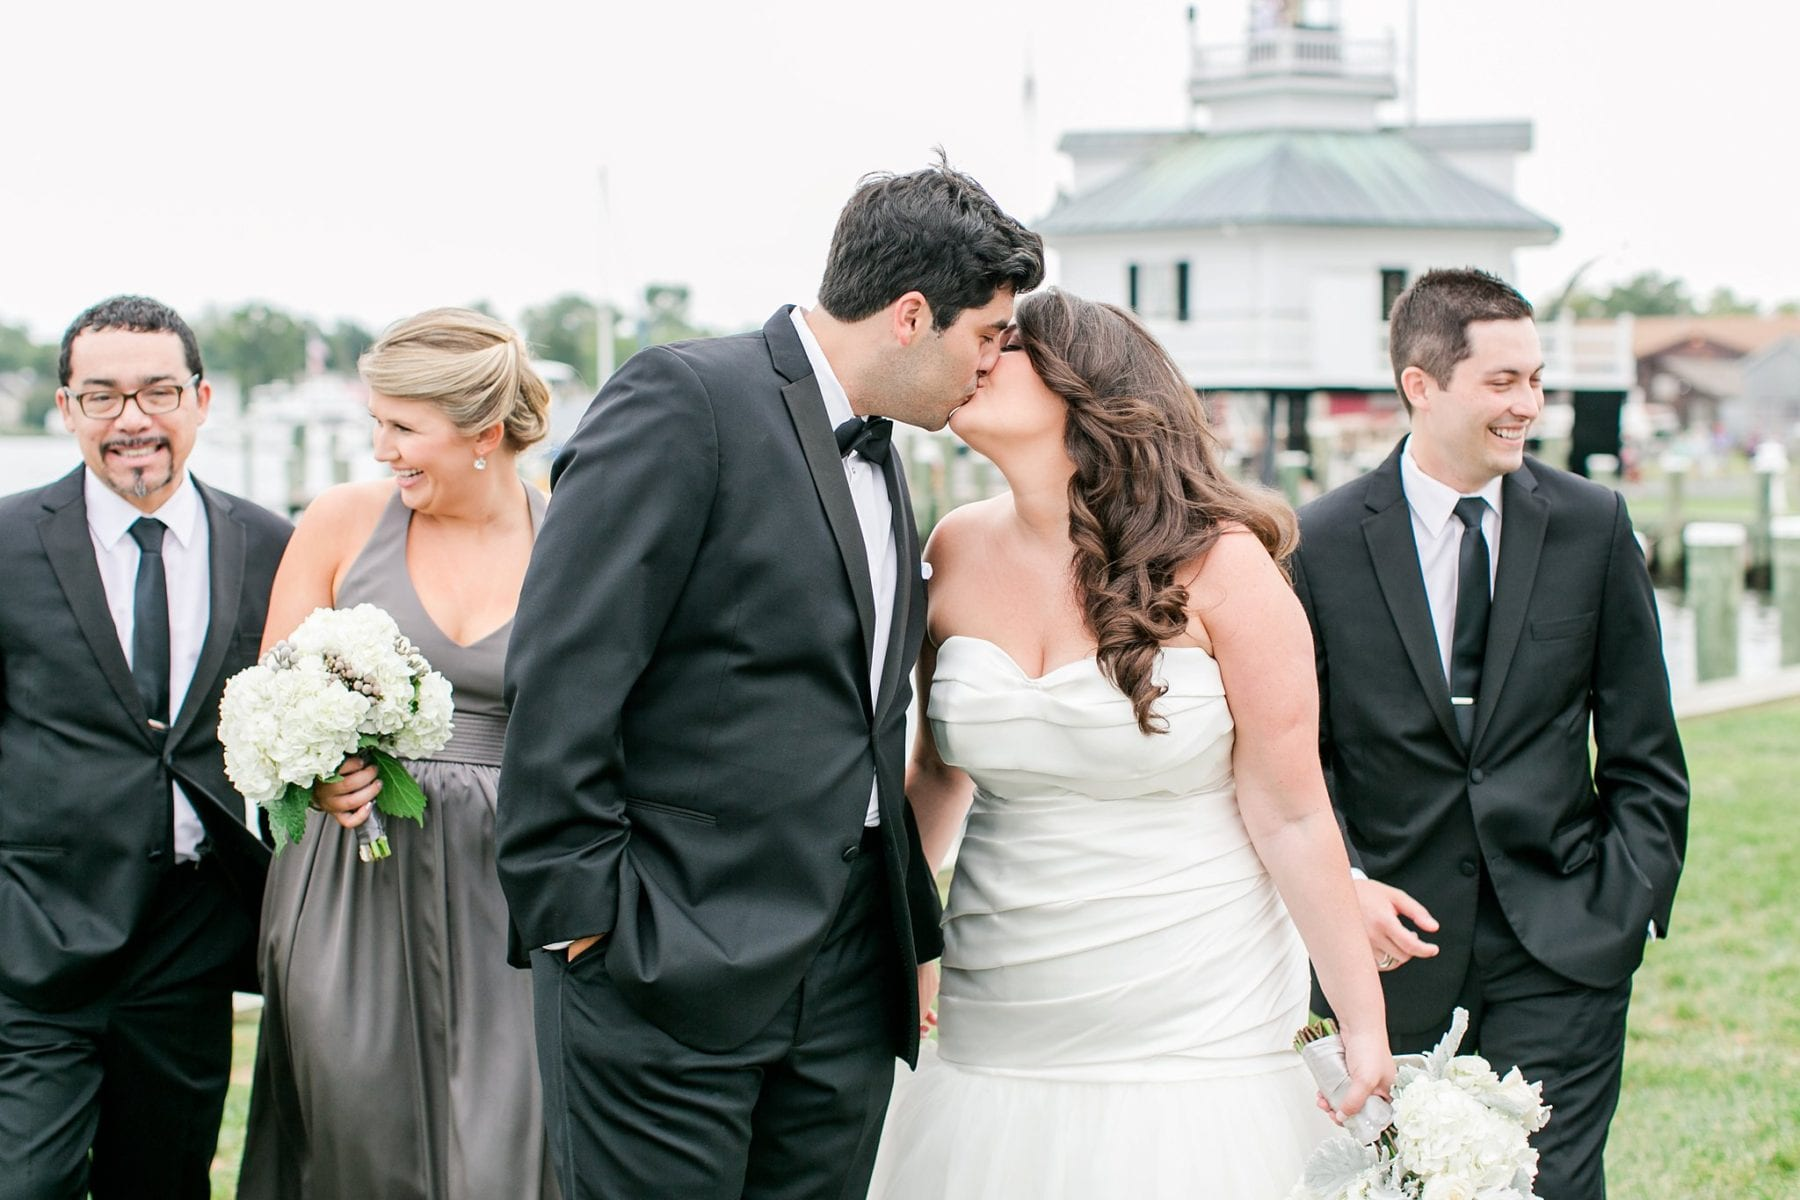 Chesapeake Bay Maritime Museum Wedding Photos Maryland Wedding Photographer Megan Kelsey Photography Halie & Mike-77.jpg